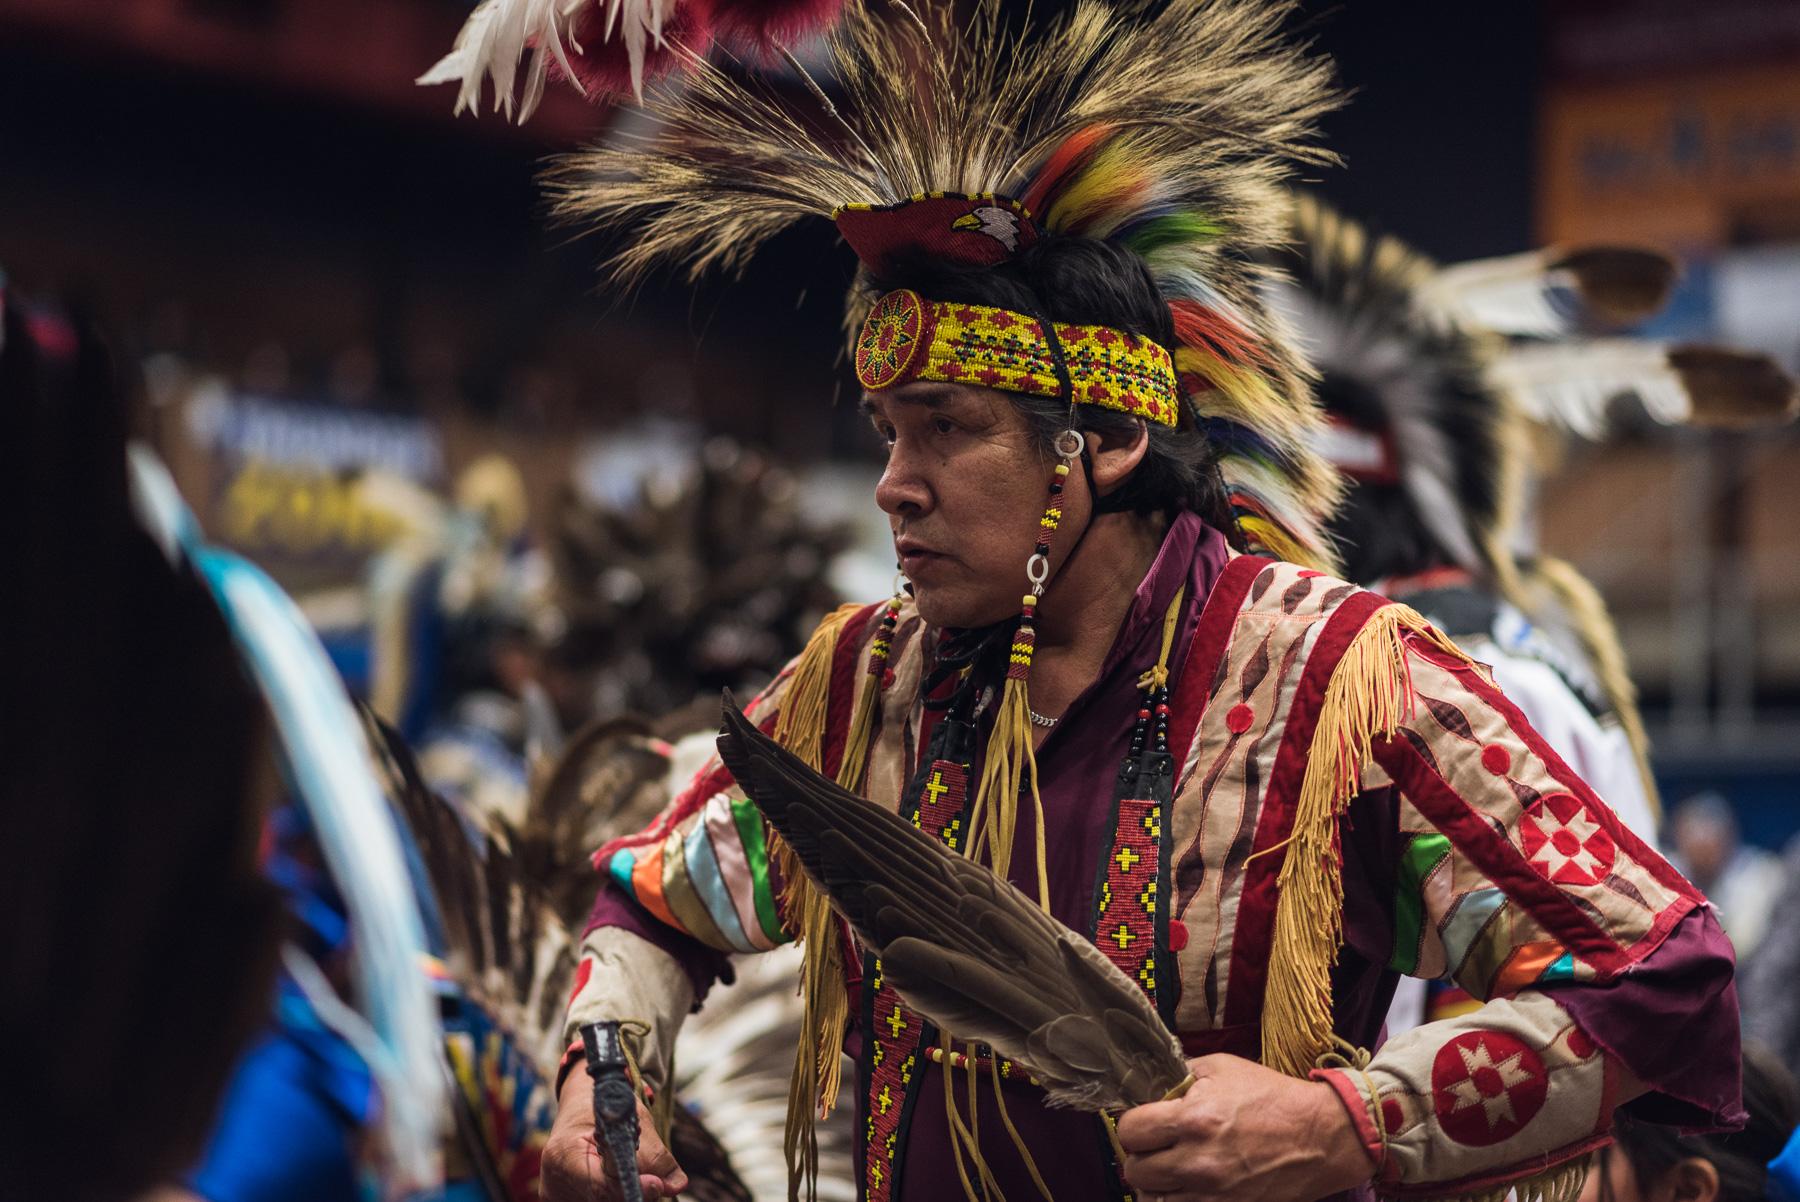 31st-Annual-LUNSA-Powwow-Blog-128.jpg